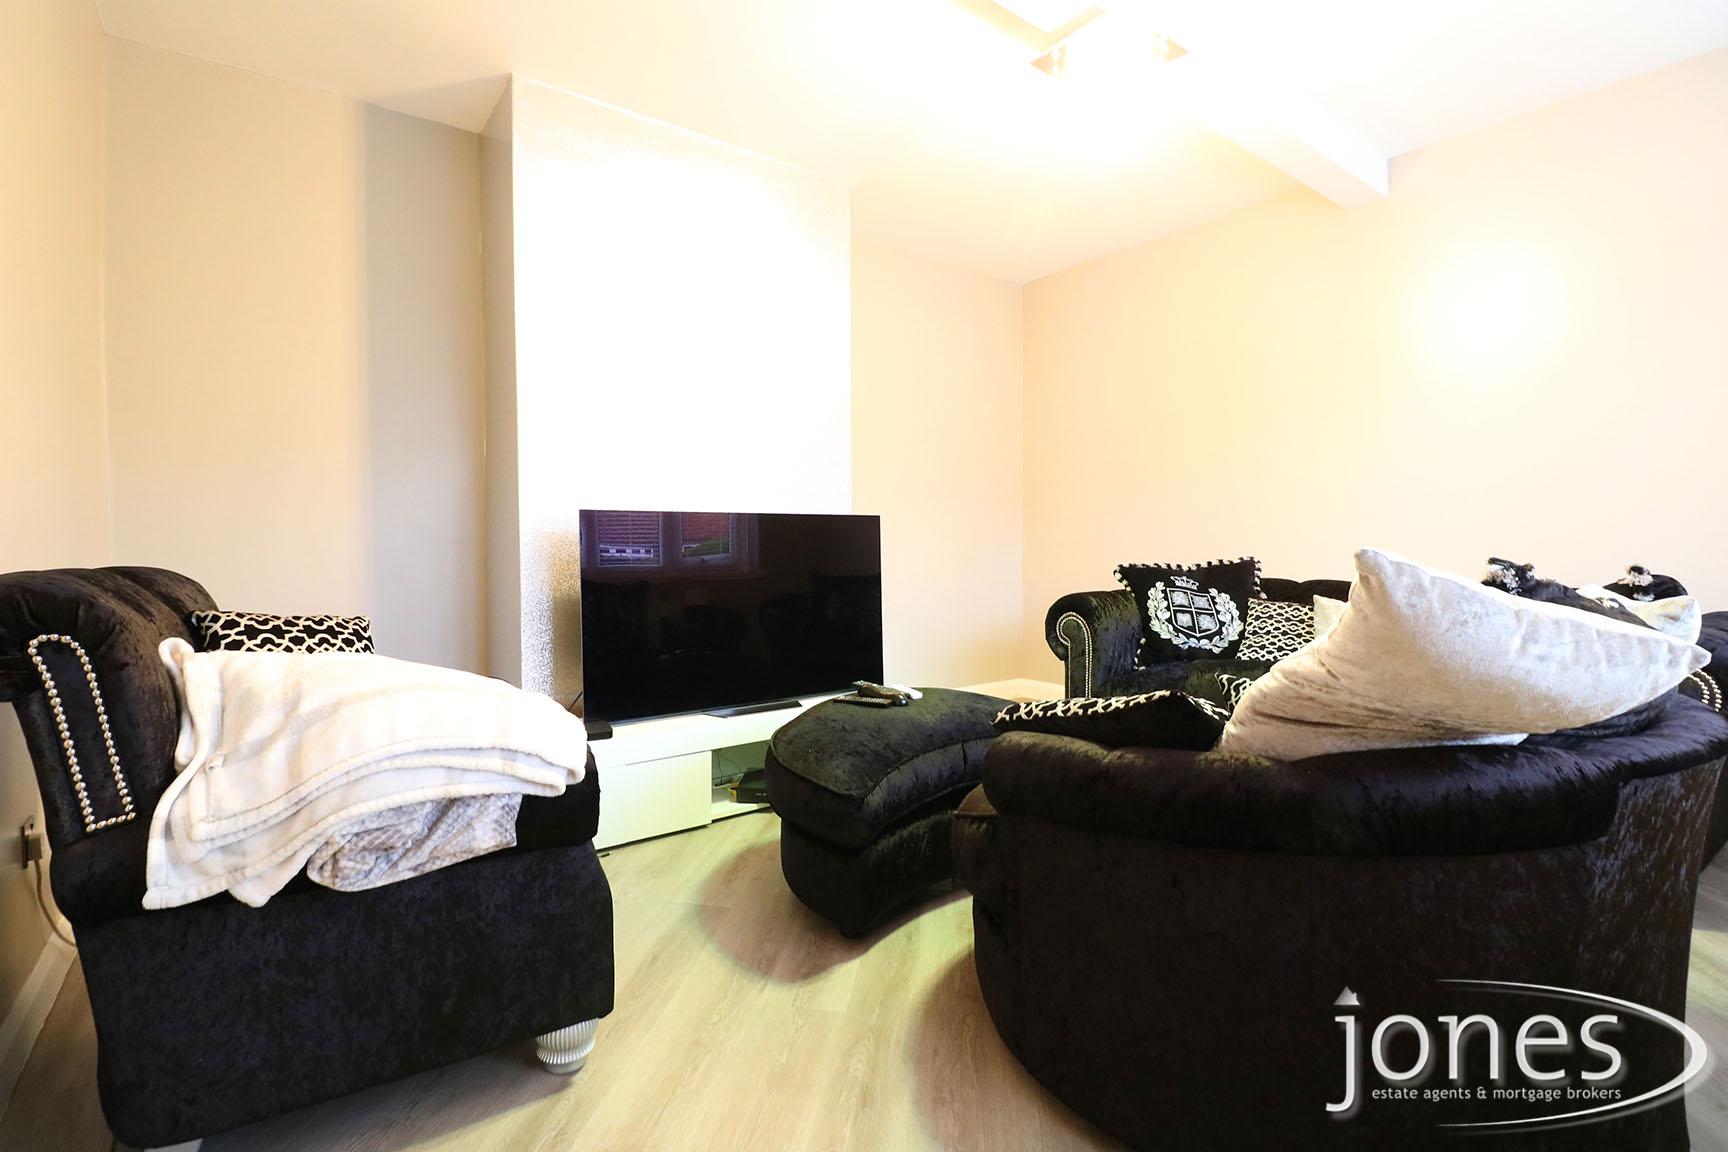 Home for Sale Let - Photo 02 Feetham Avenue, Darlington, DL1 2DY